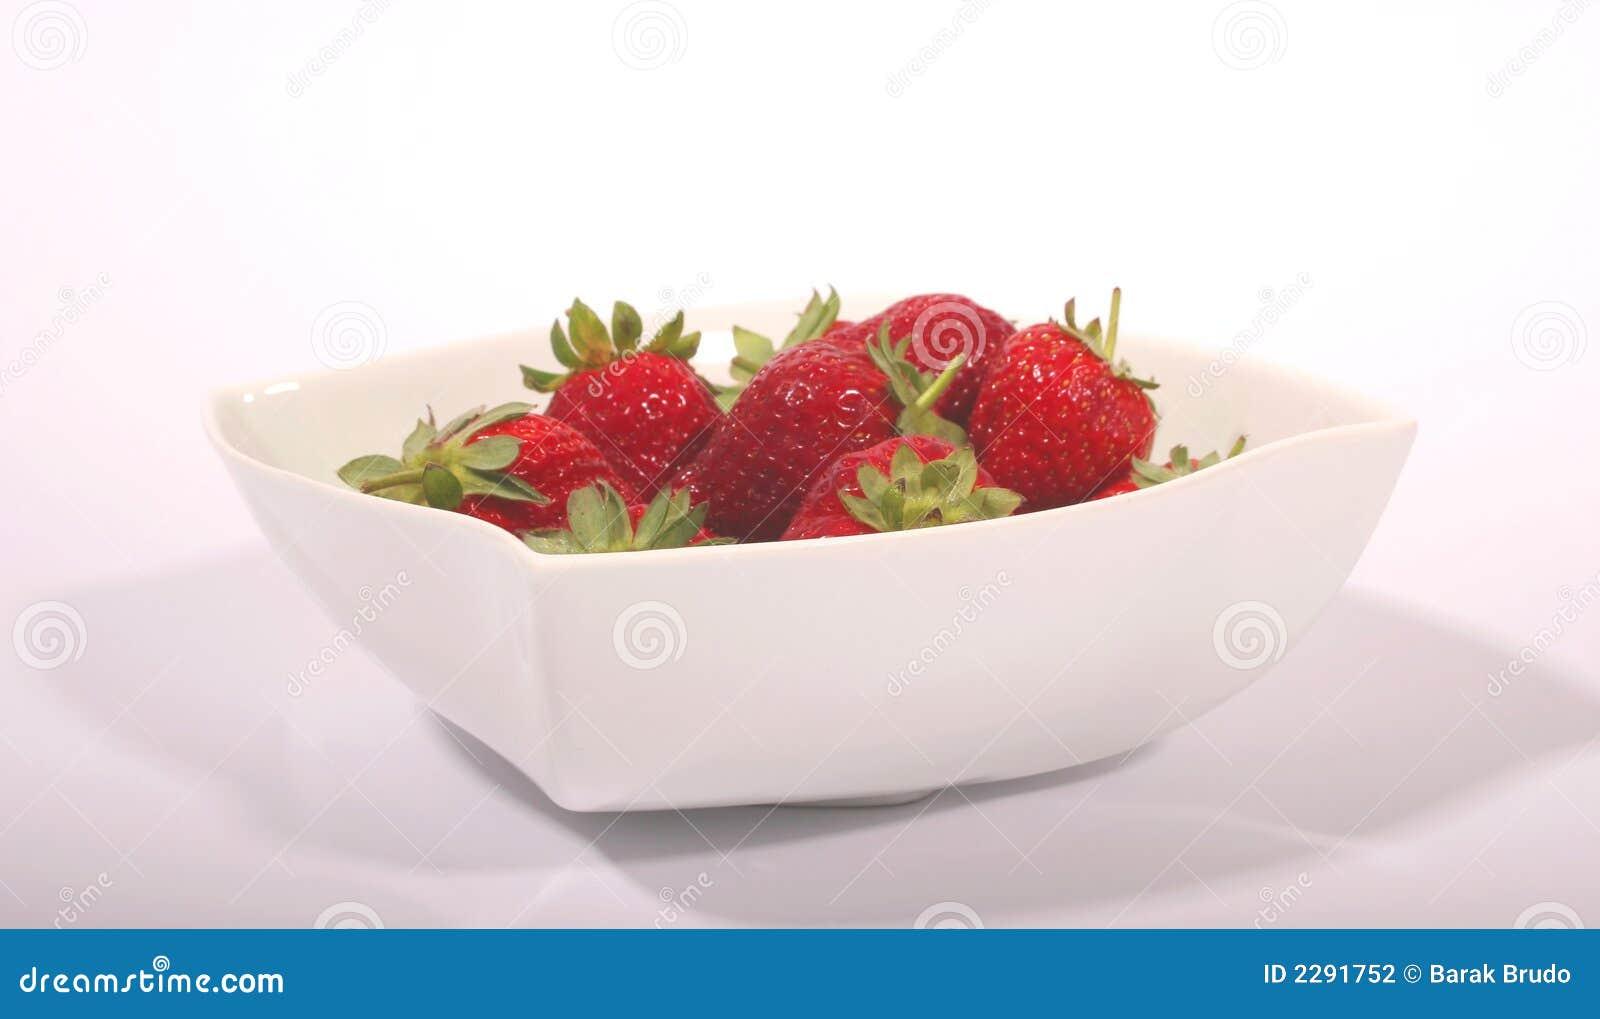 Strawberry Bowl #2